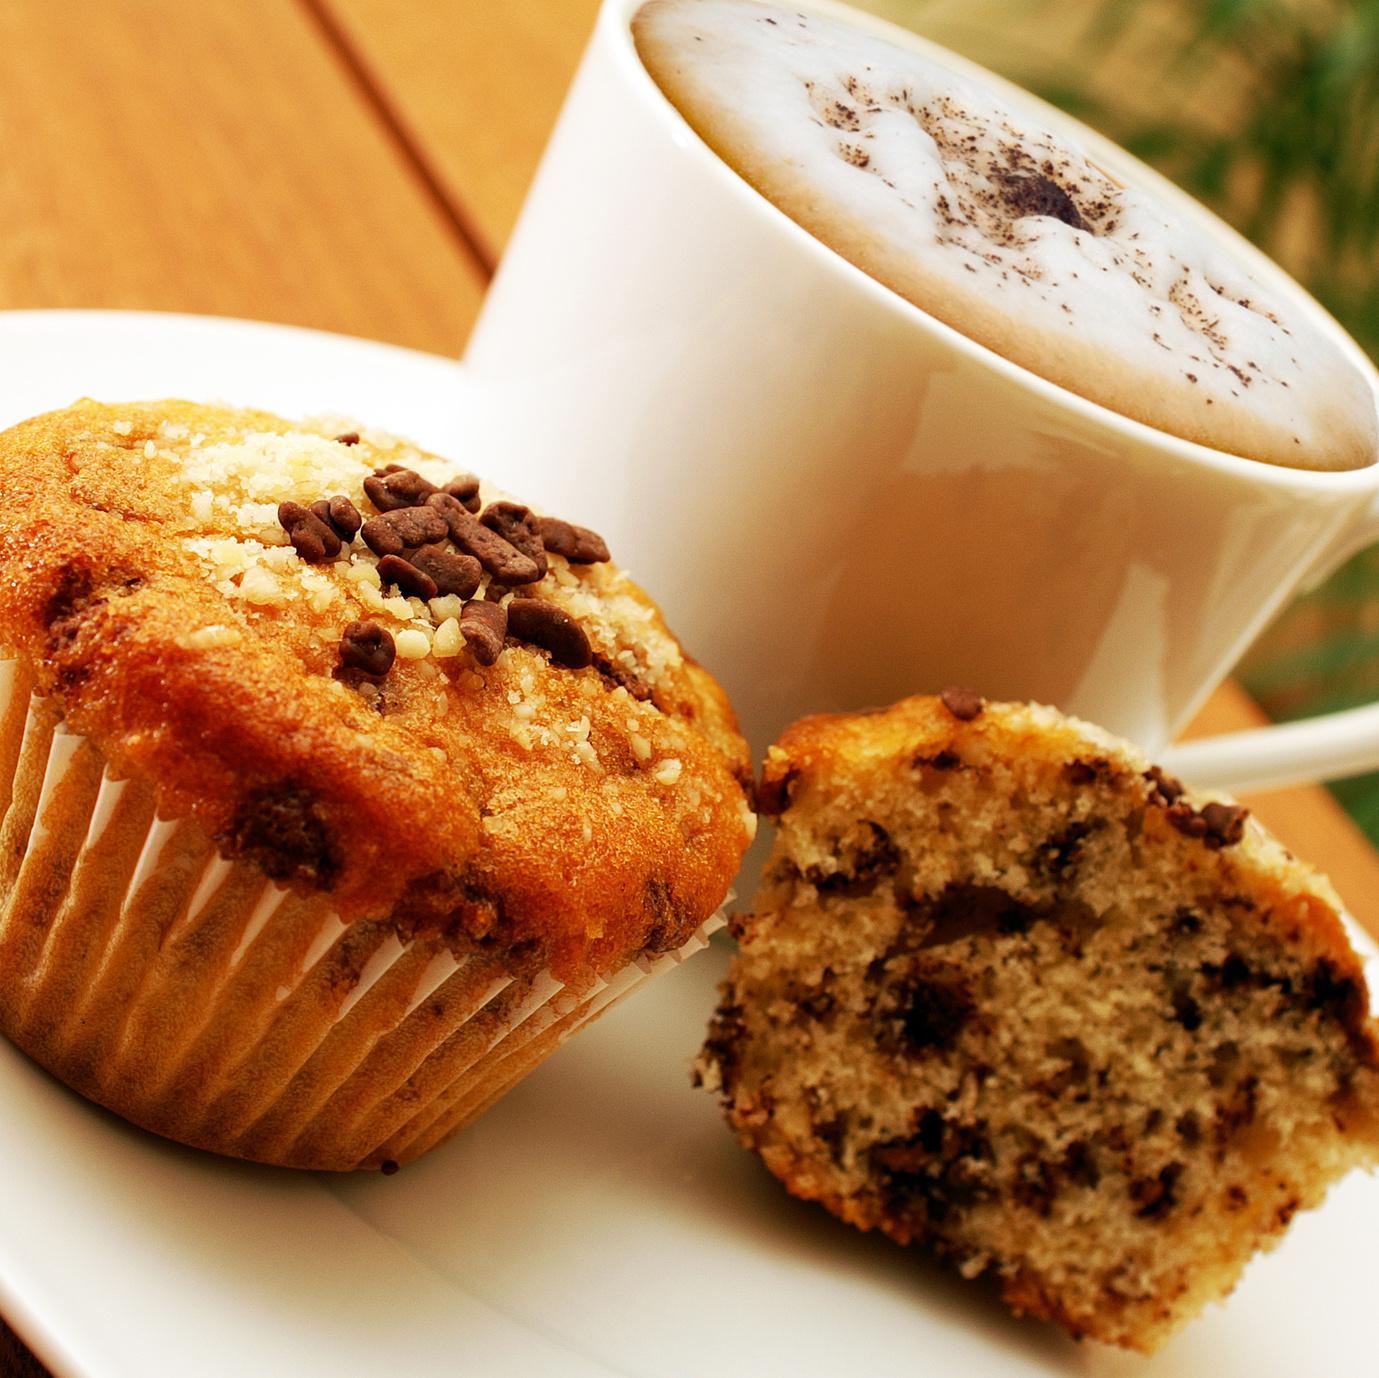 1054592116_fotolia_3908400_-Muffins